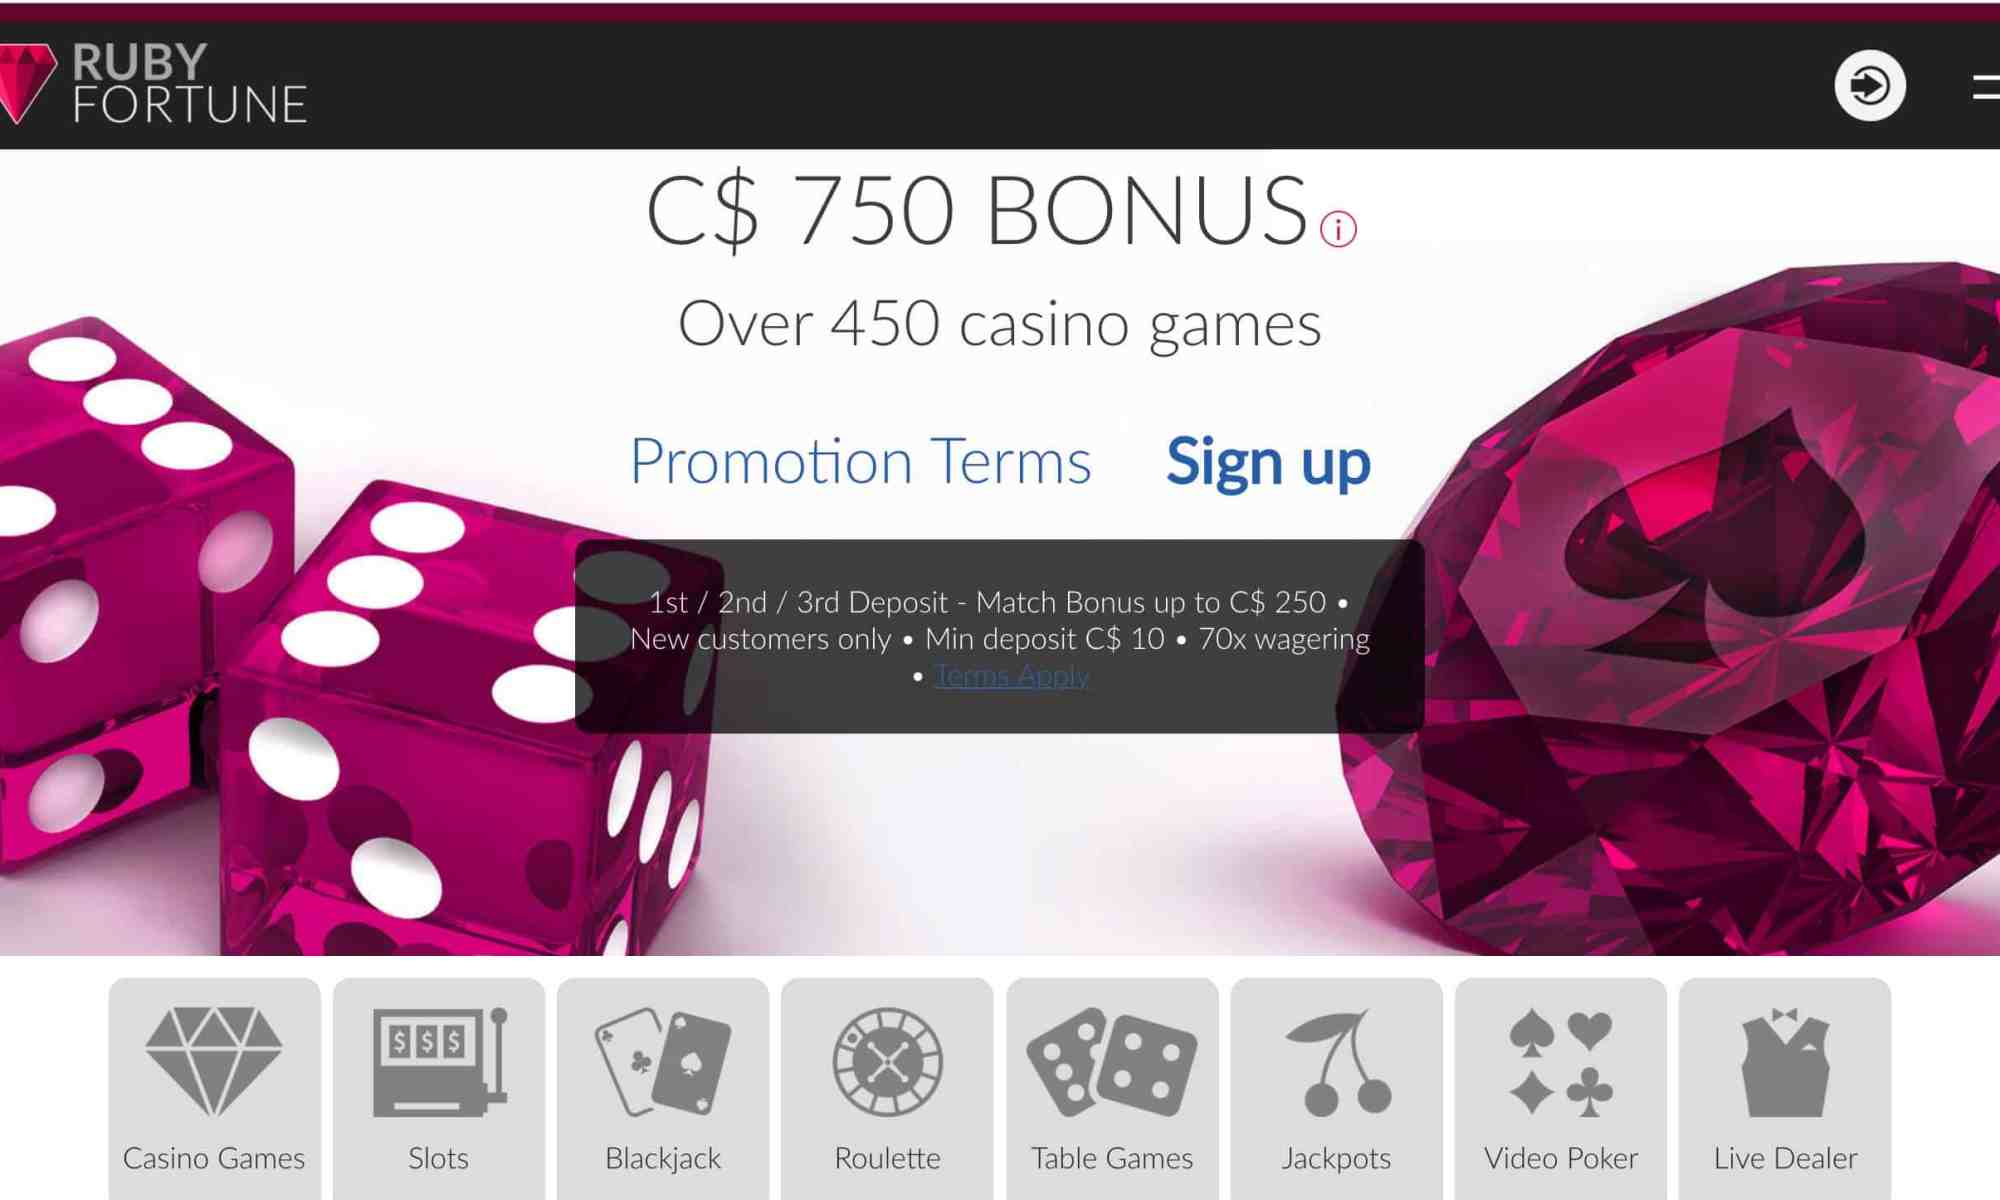 Ruby Fortune Casino - get a $750 free deposit bonus